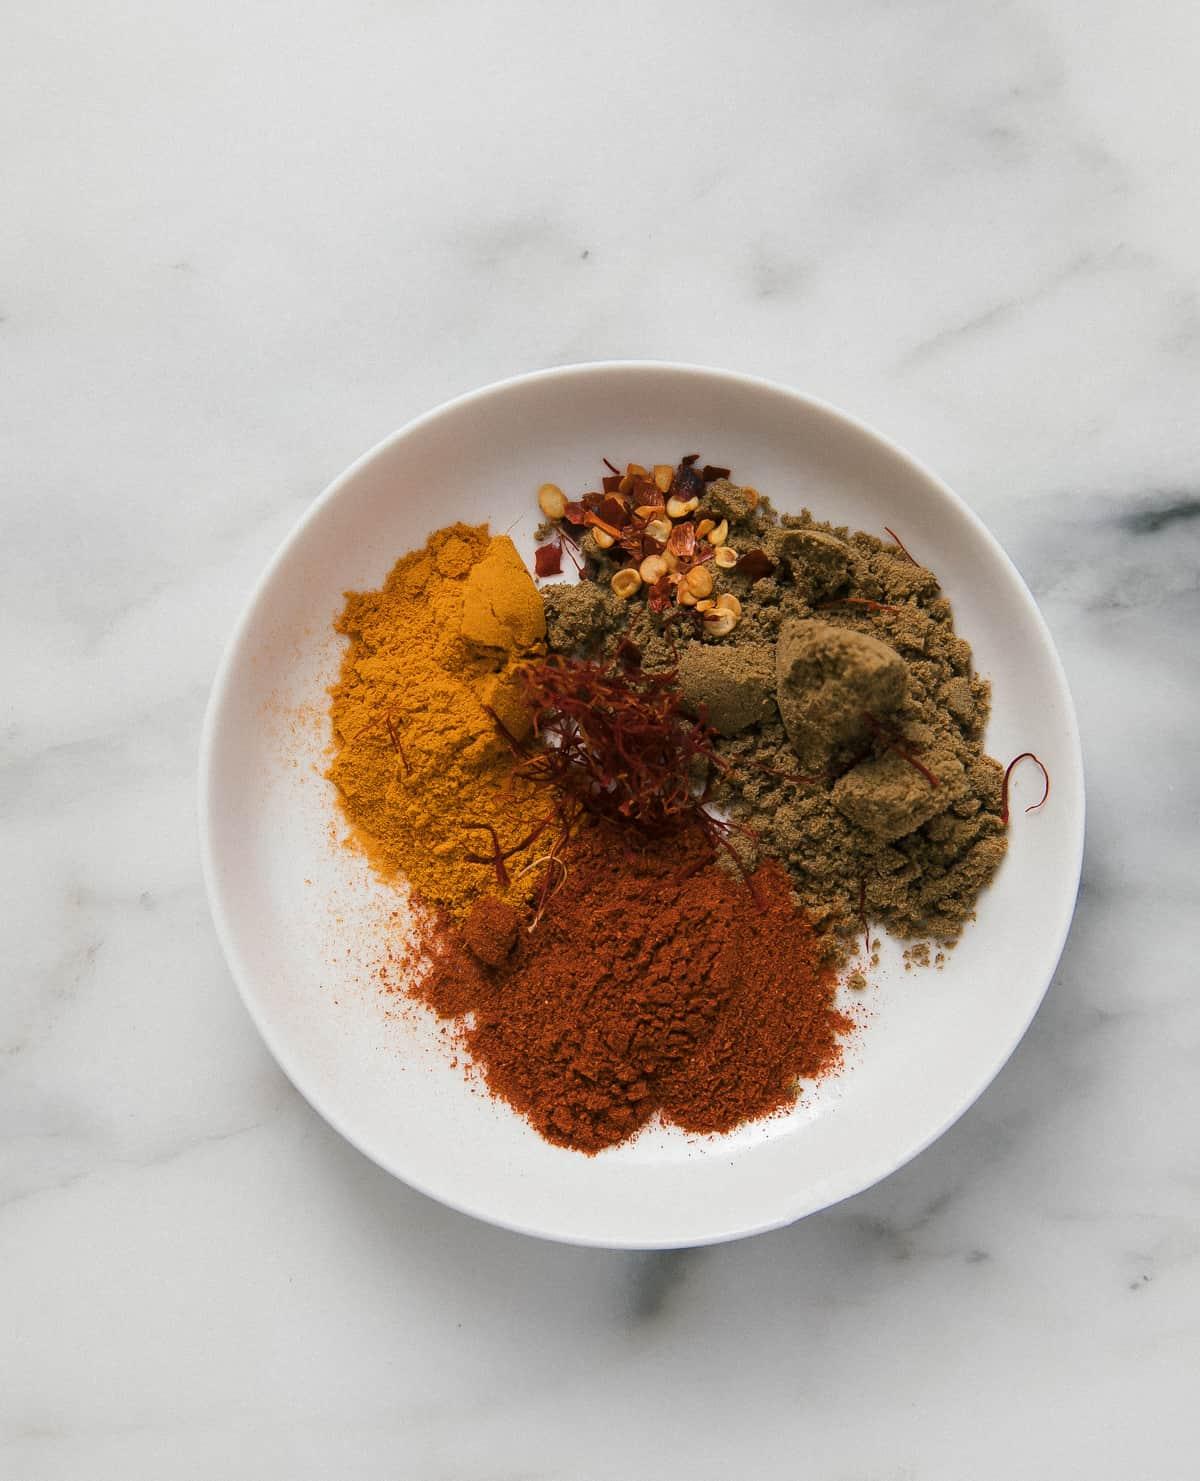 shot of spices: turmeric, paprika, cumin, saffron